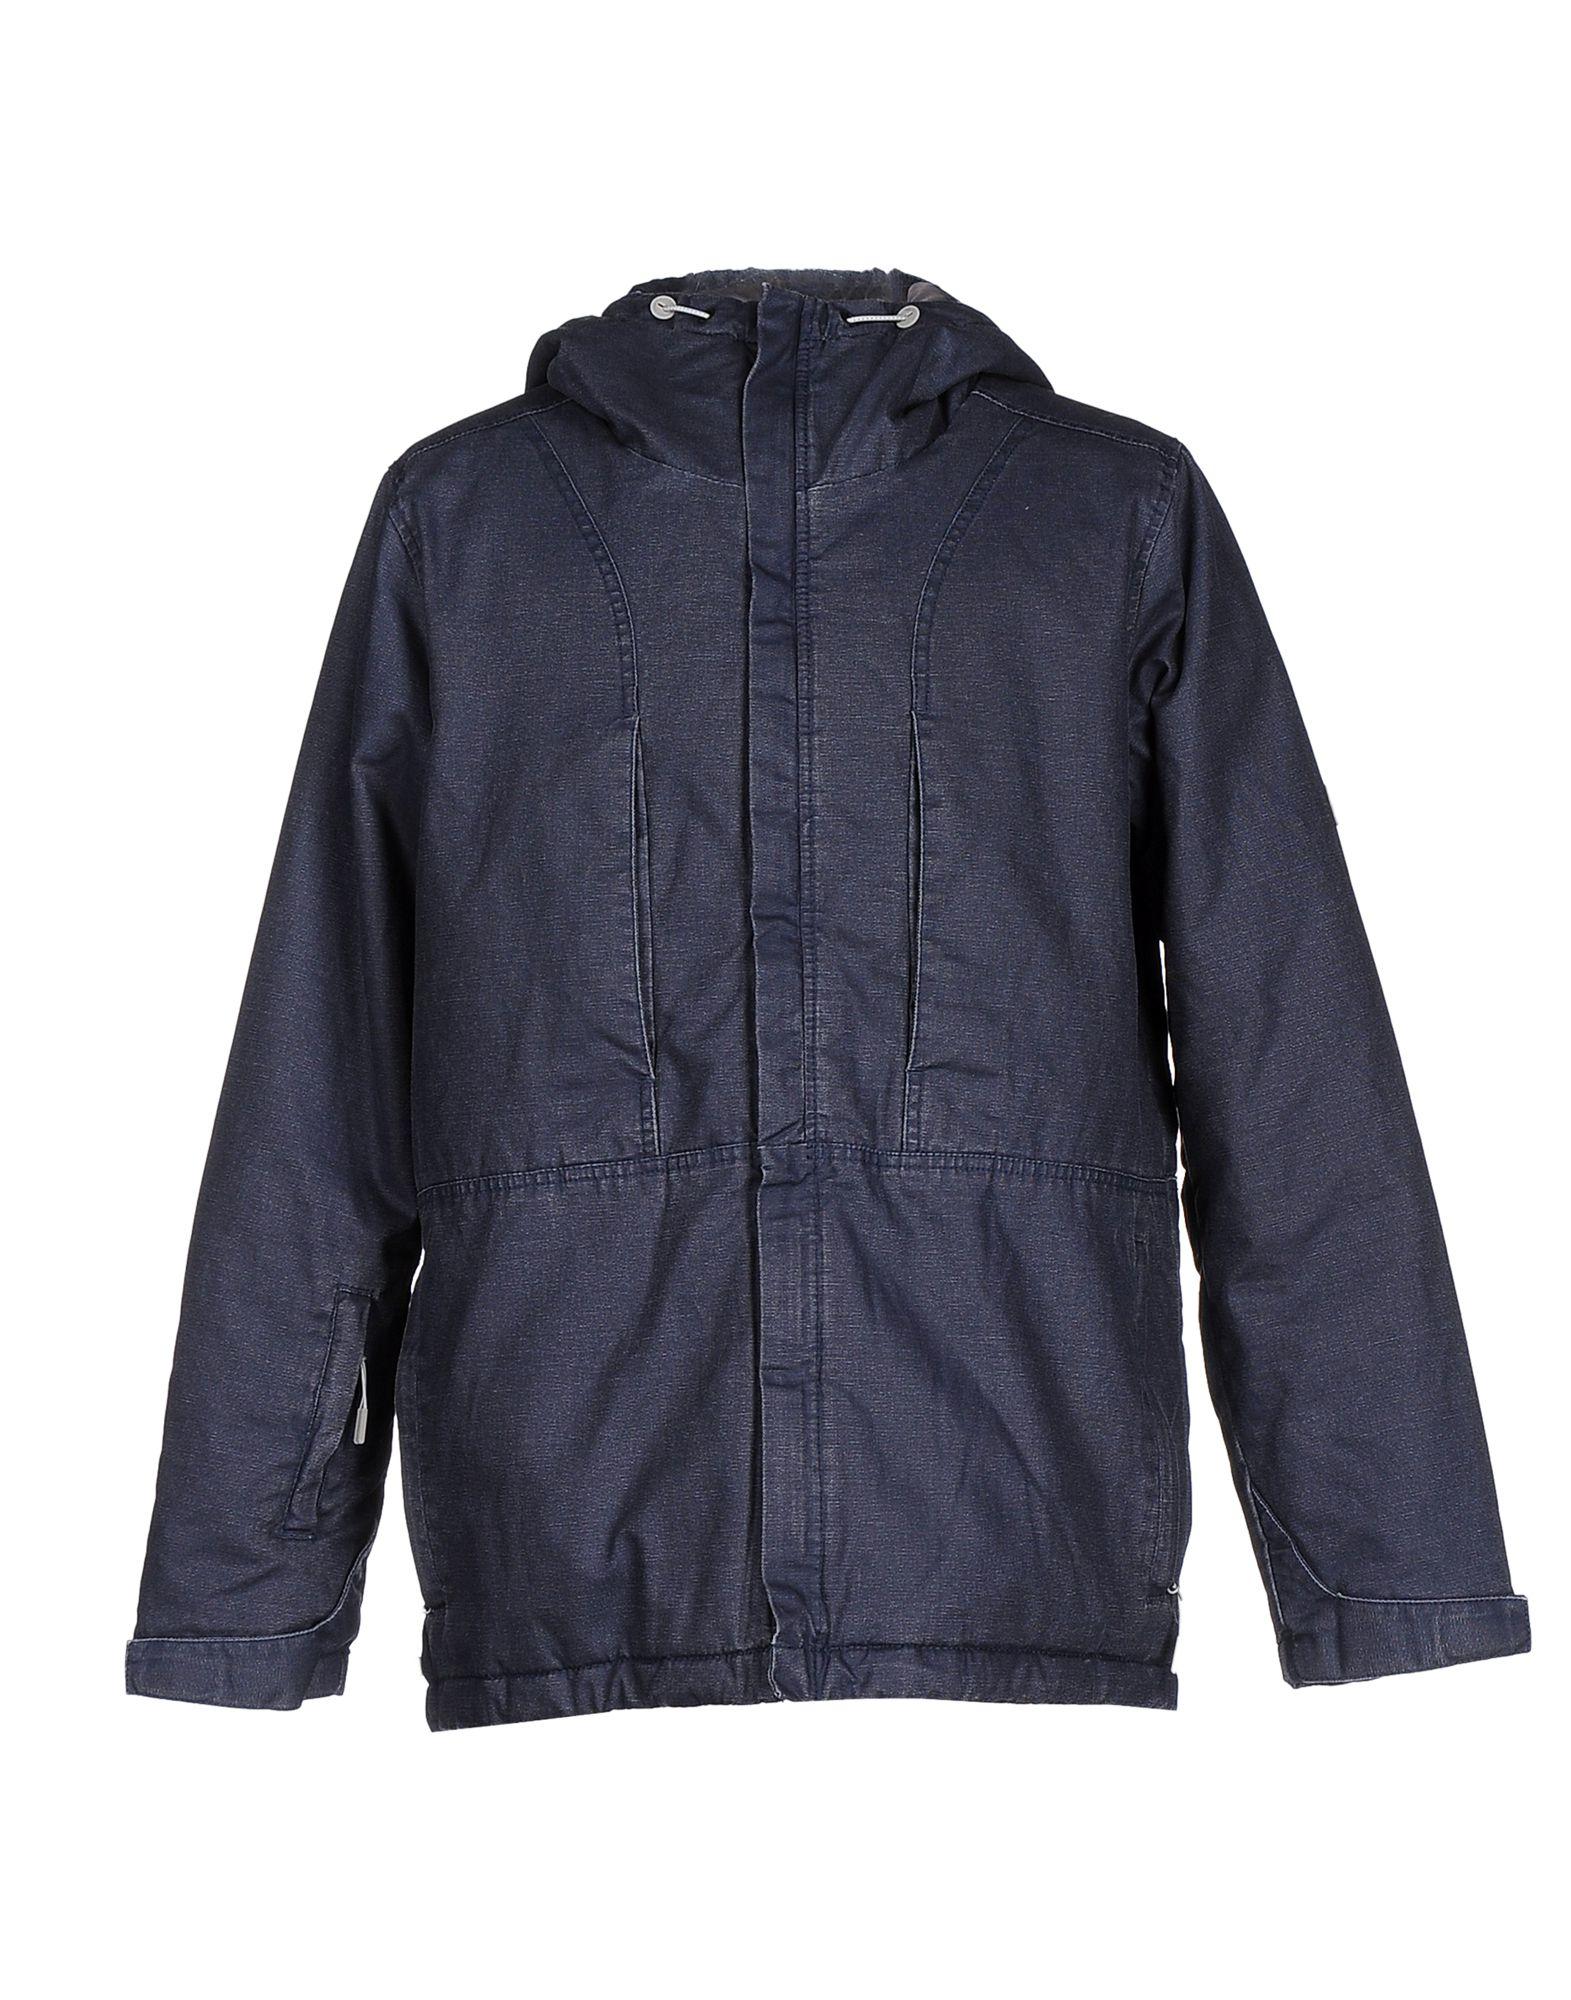 Bench Jacket In Blue For Men Lyst